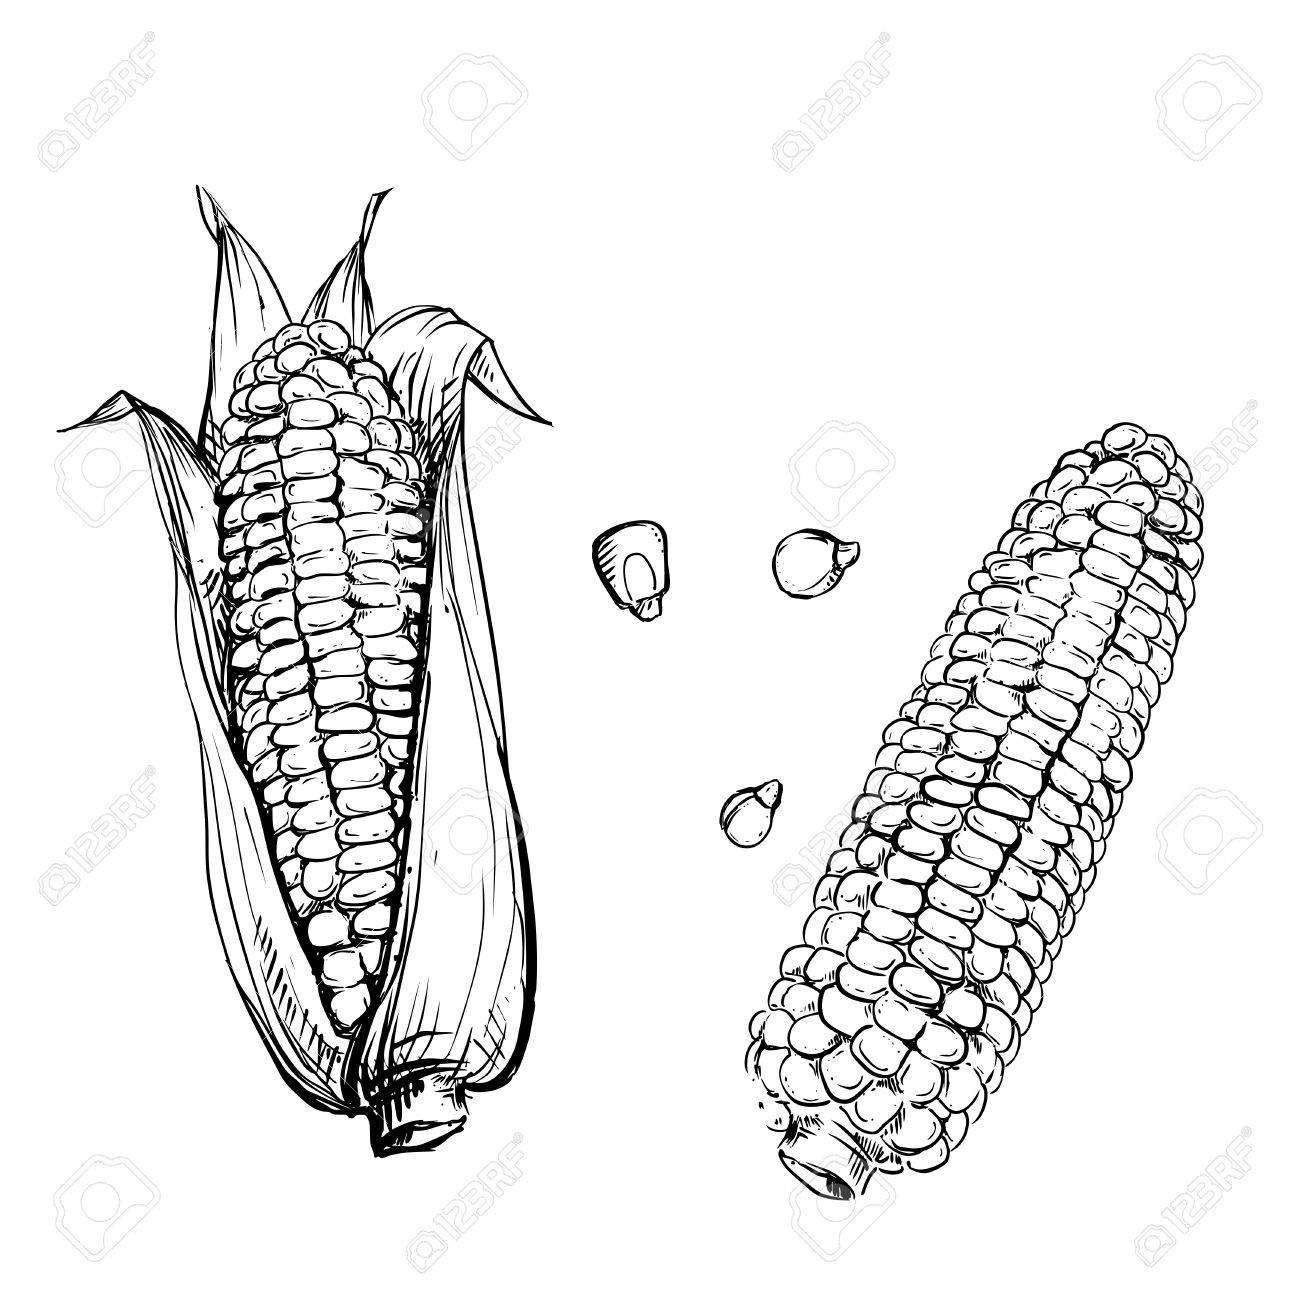 Corn Cob Drawing At Getdrawings